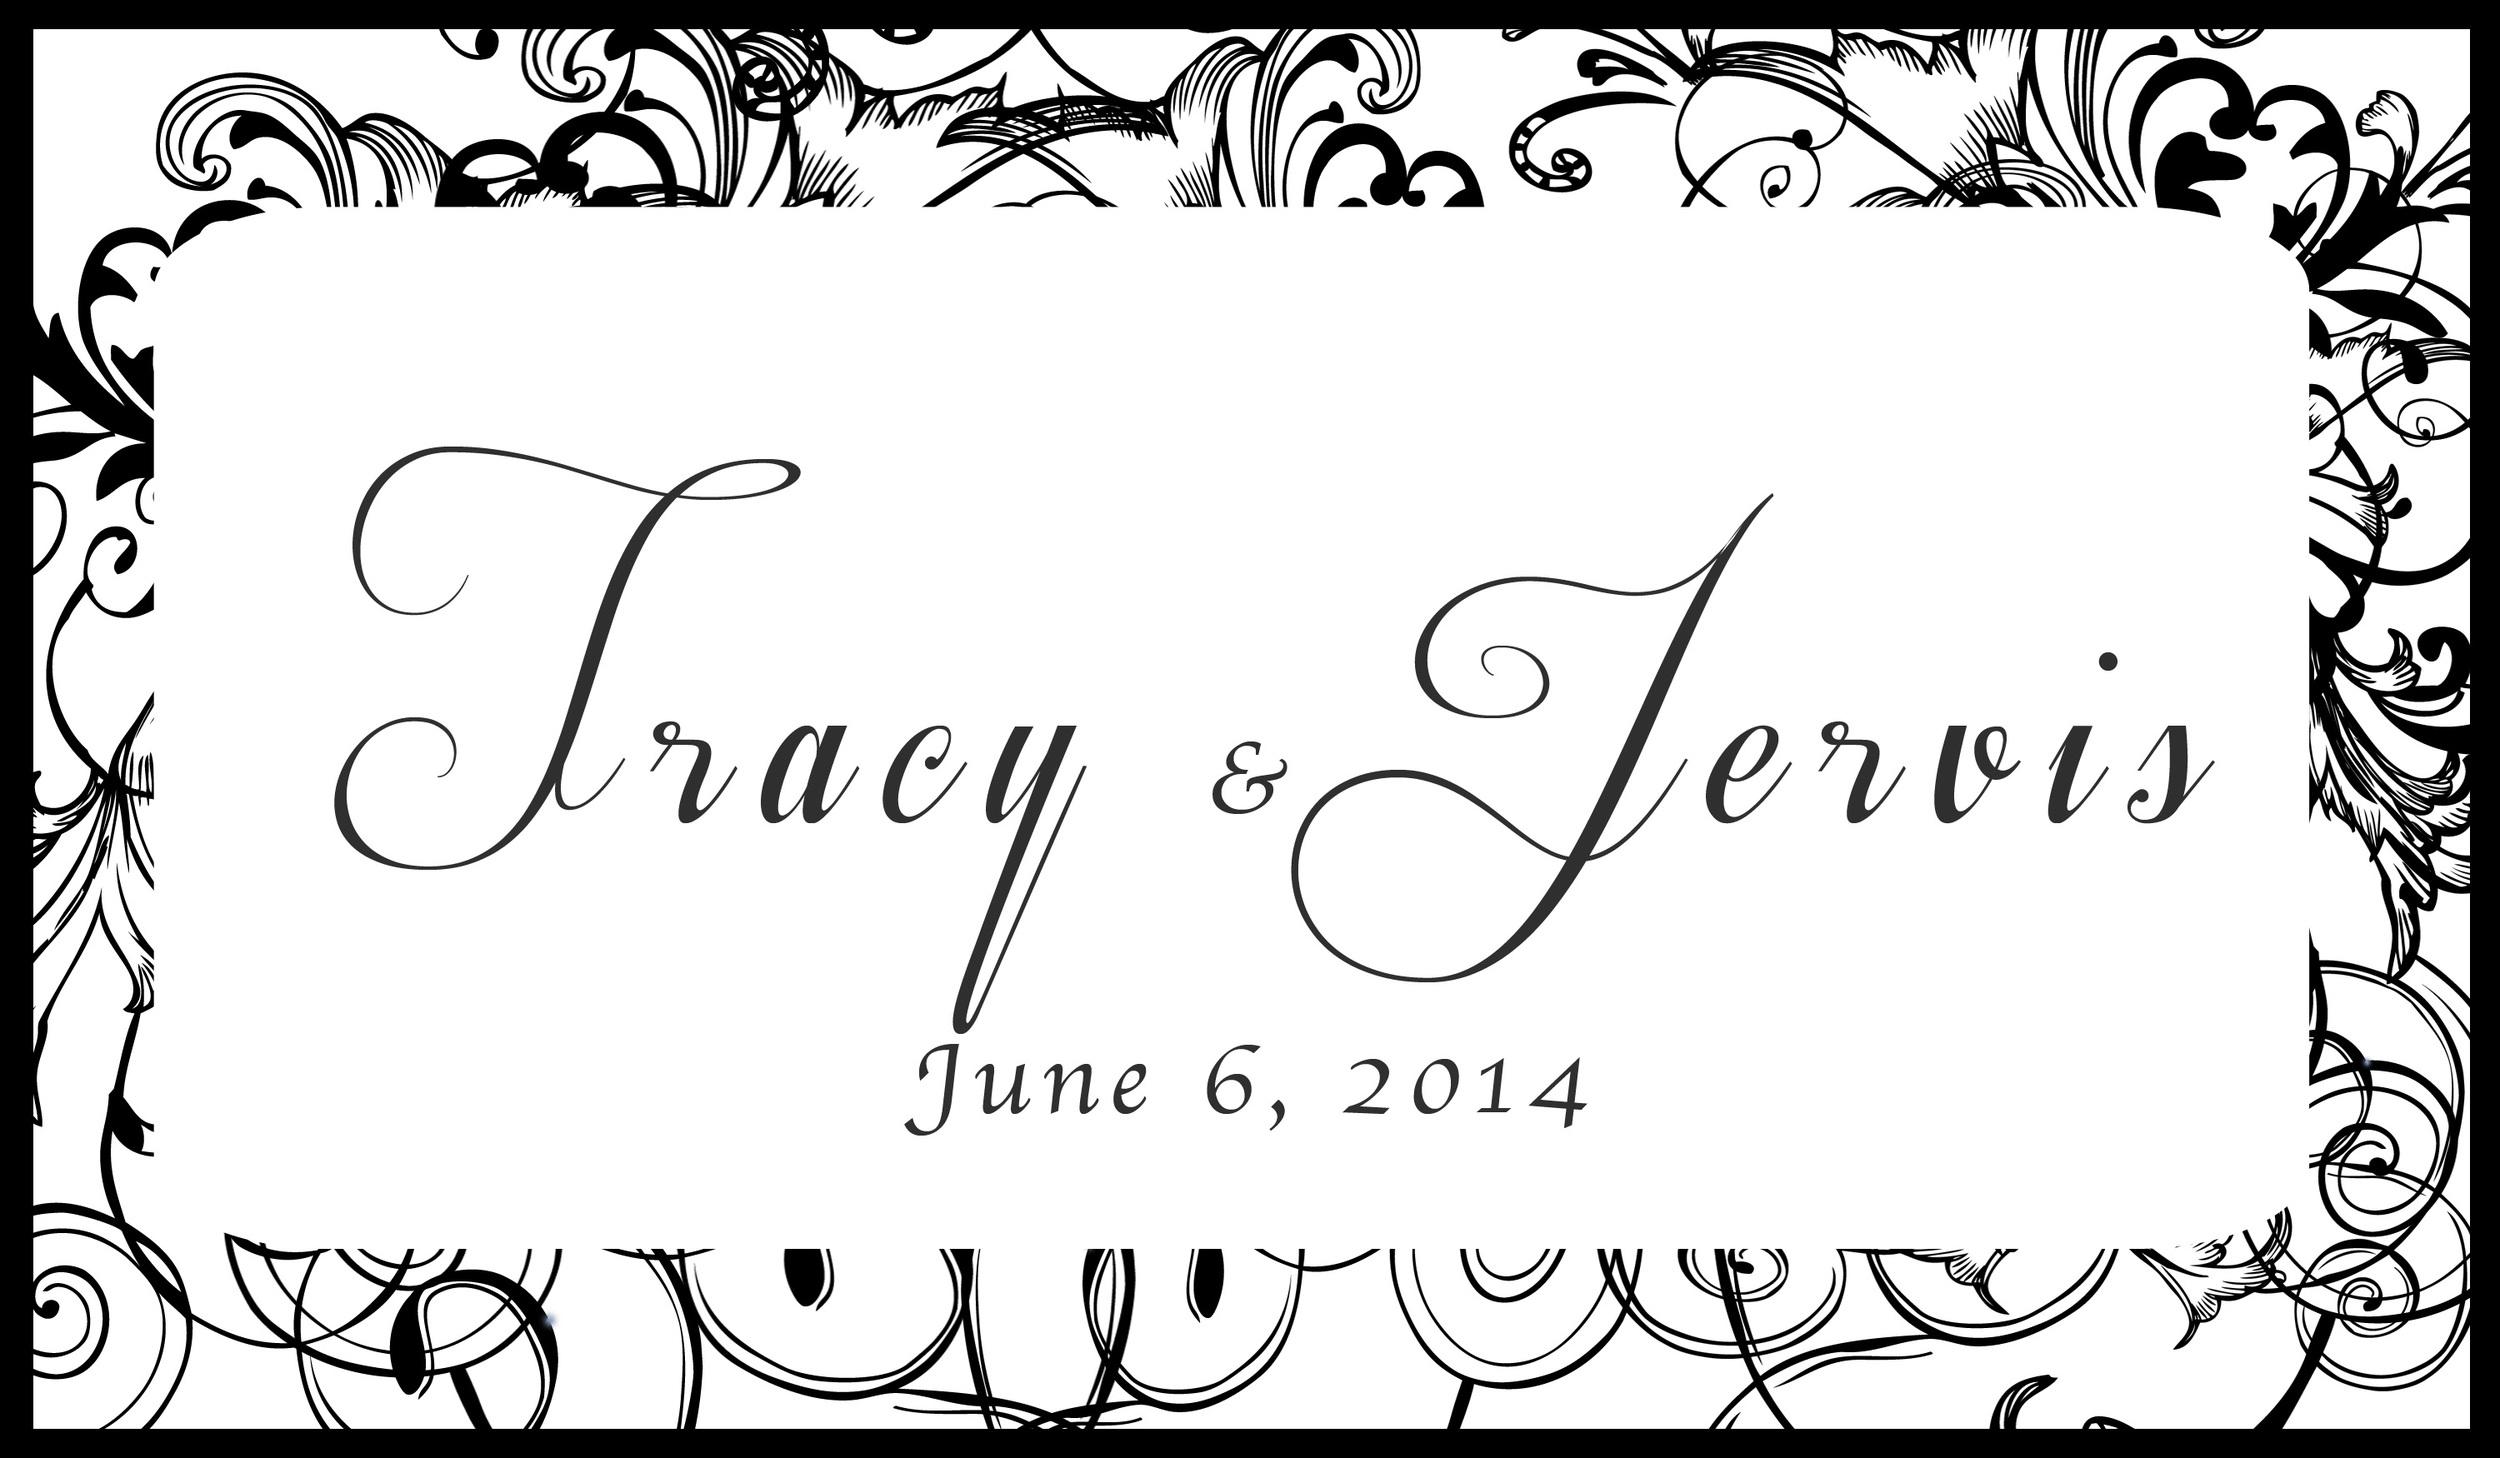 Jervis & Tracy B&W - Respective Font.jpg